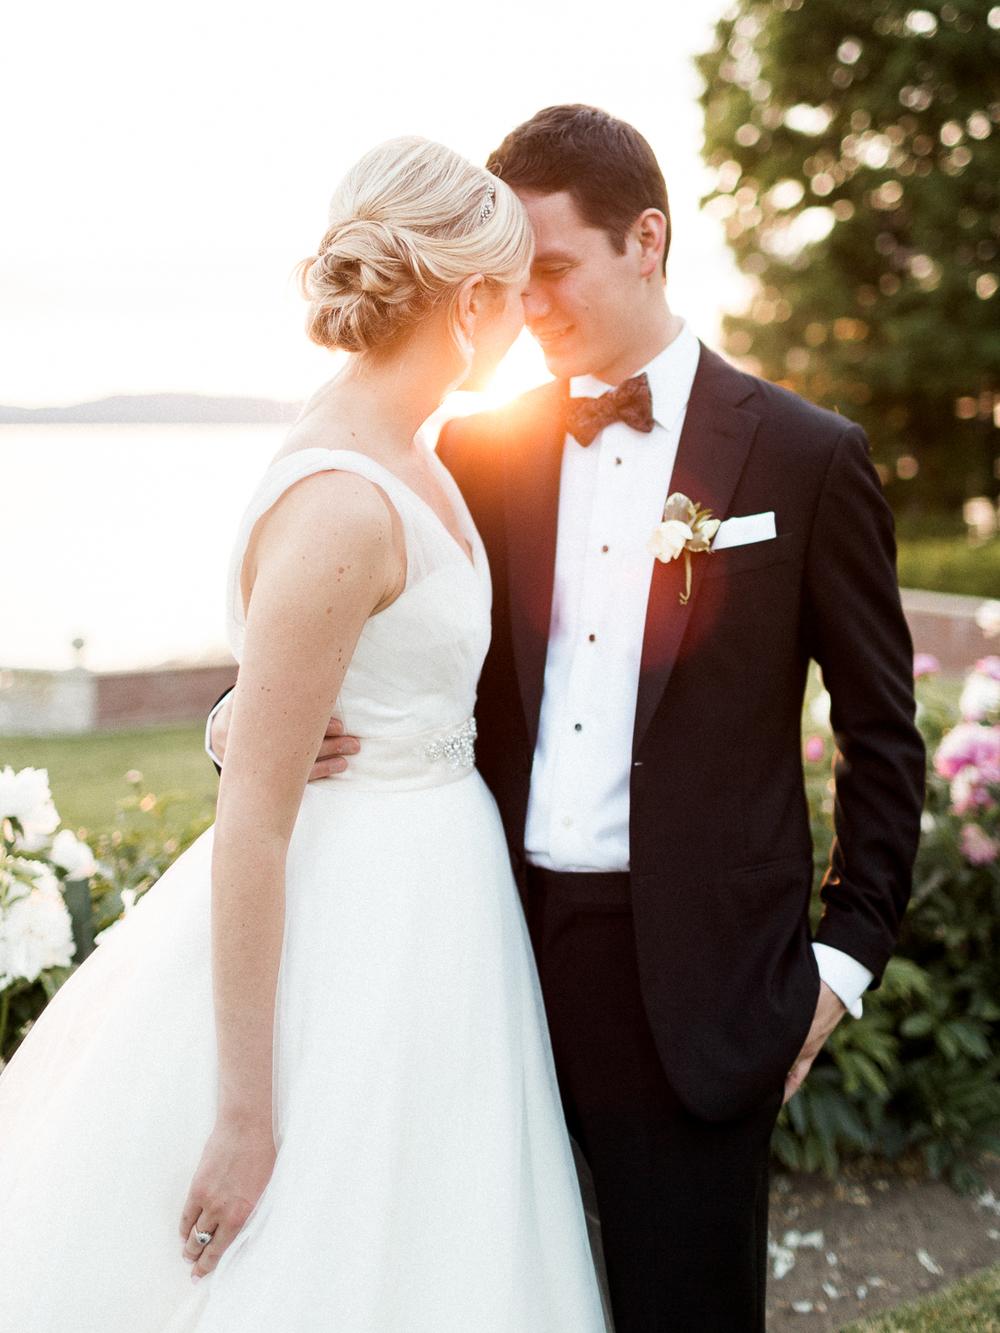 20160618-LP-Wedding-285021000659-5501.jpg